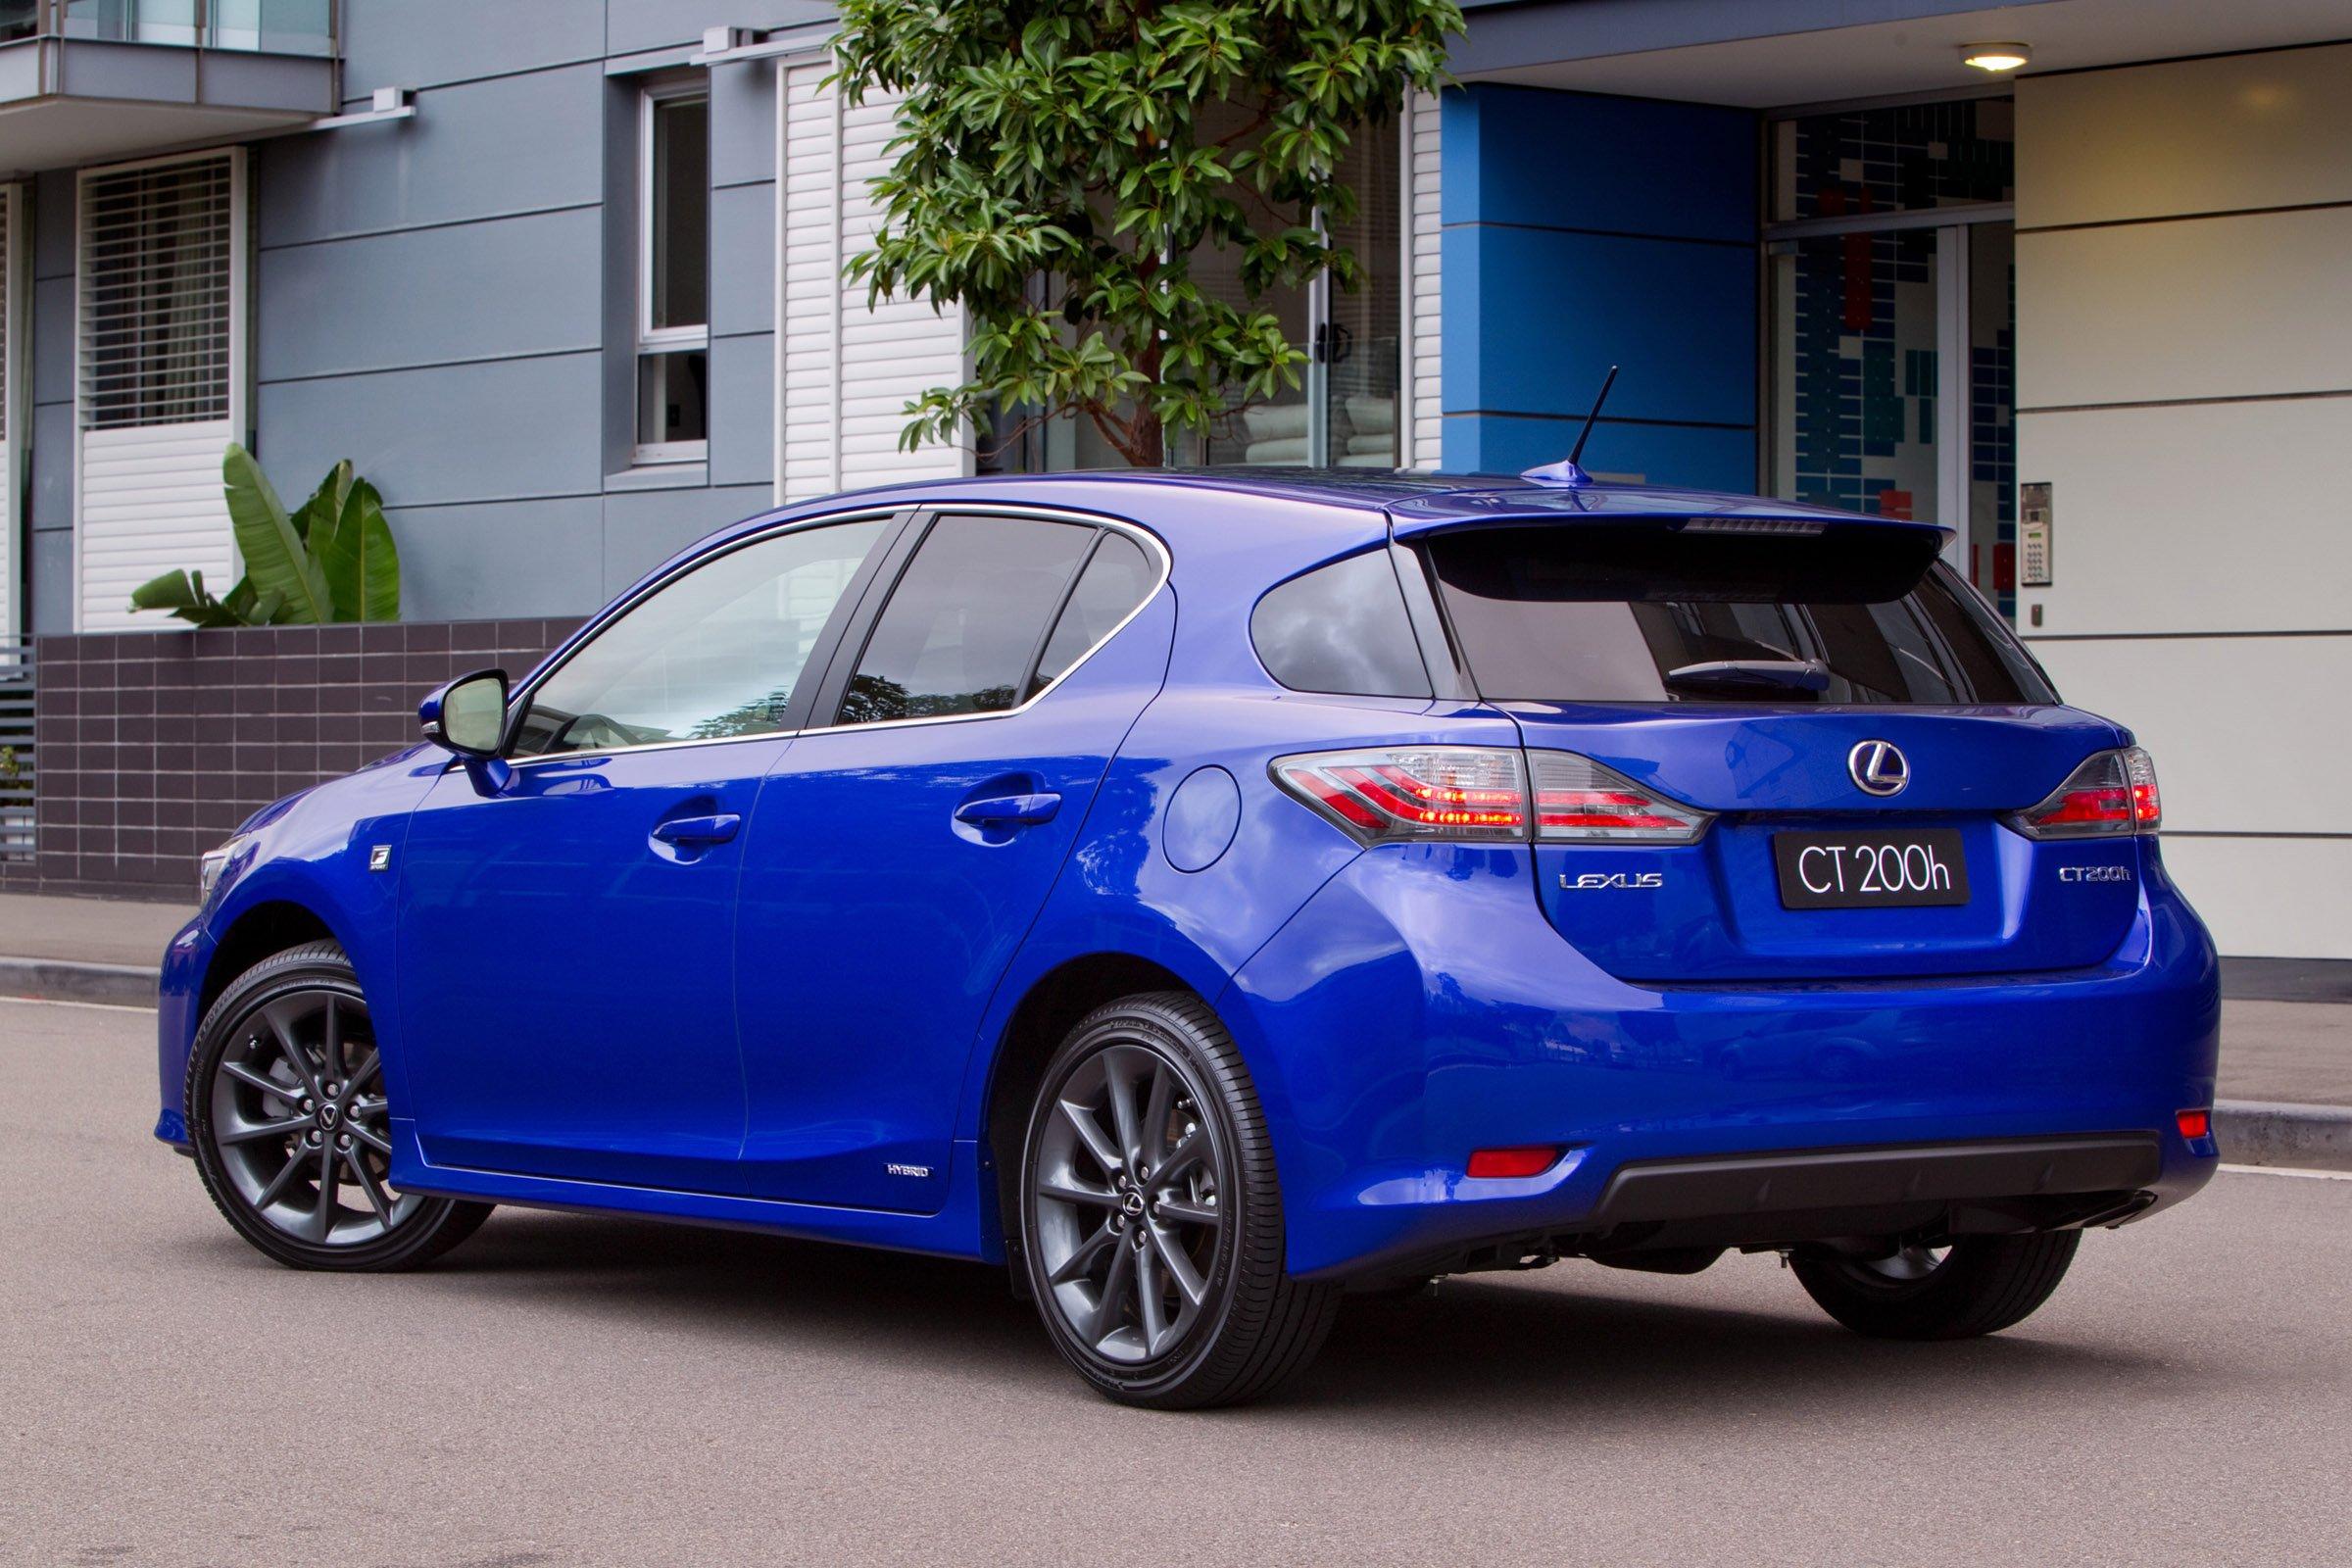 Toyota в Китае отзовет более 670 автомобилей из-за дефекта